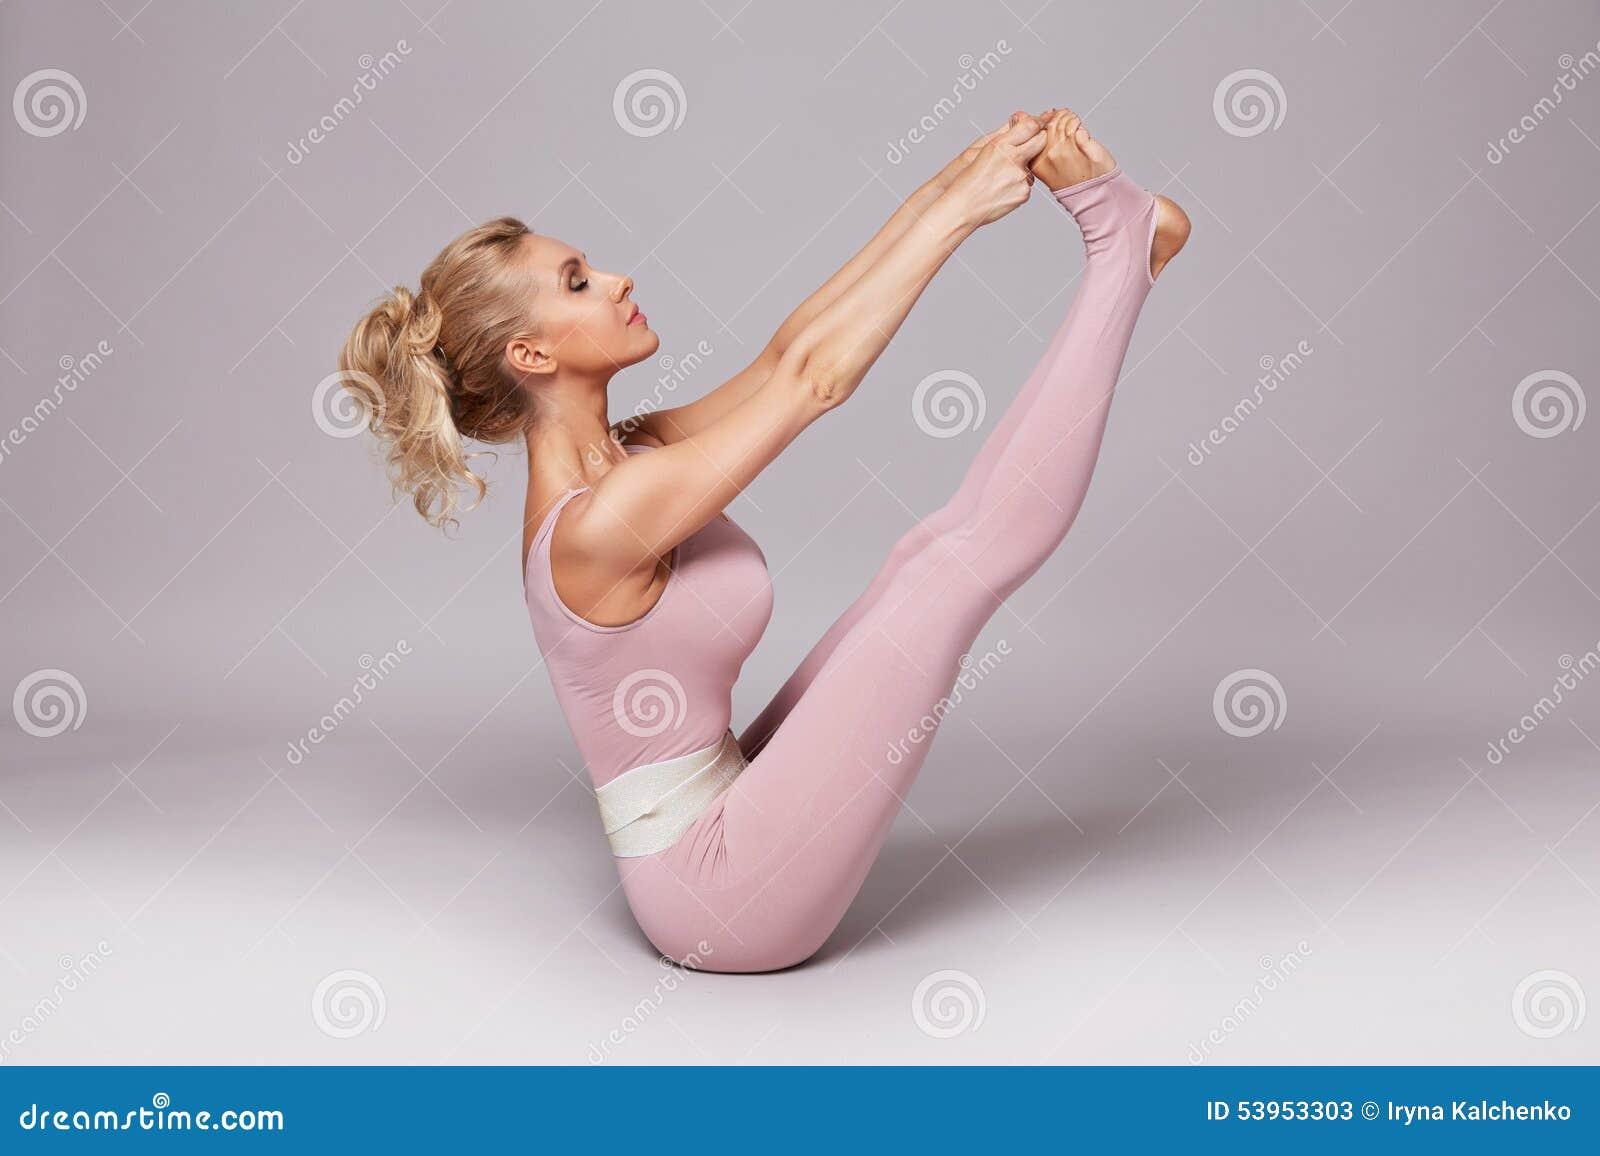 Beauty woman sport yoga pilates fitness body shape clothes